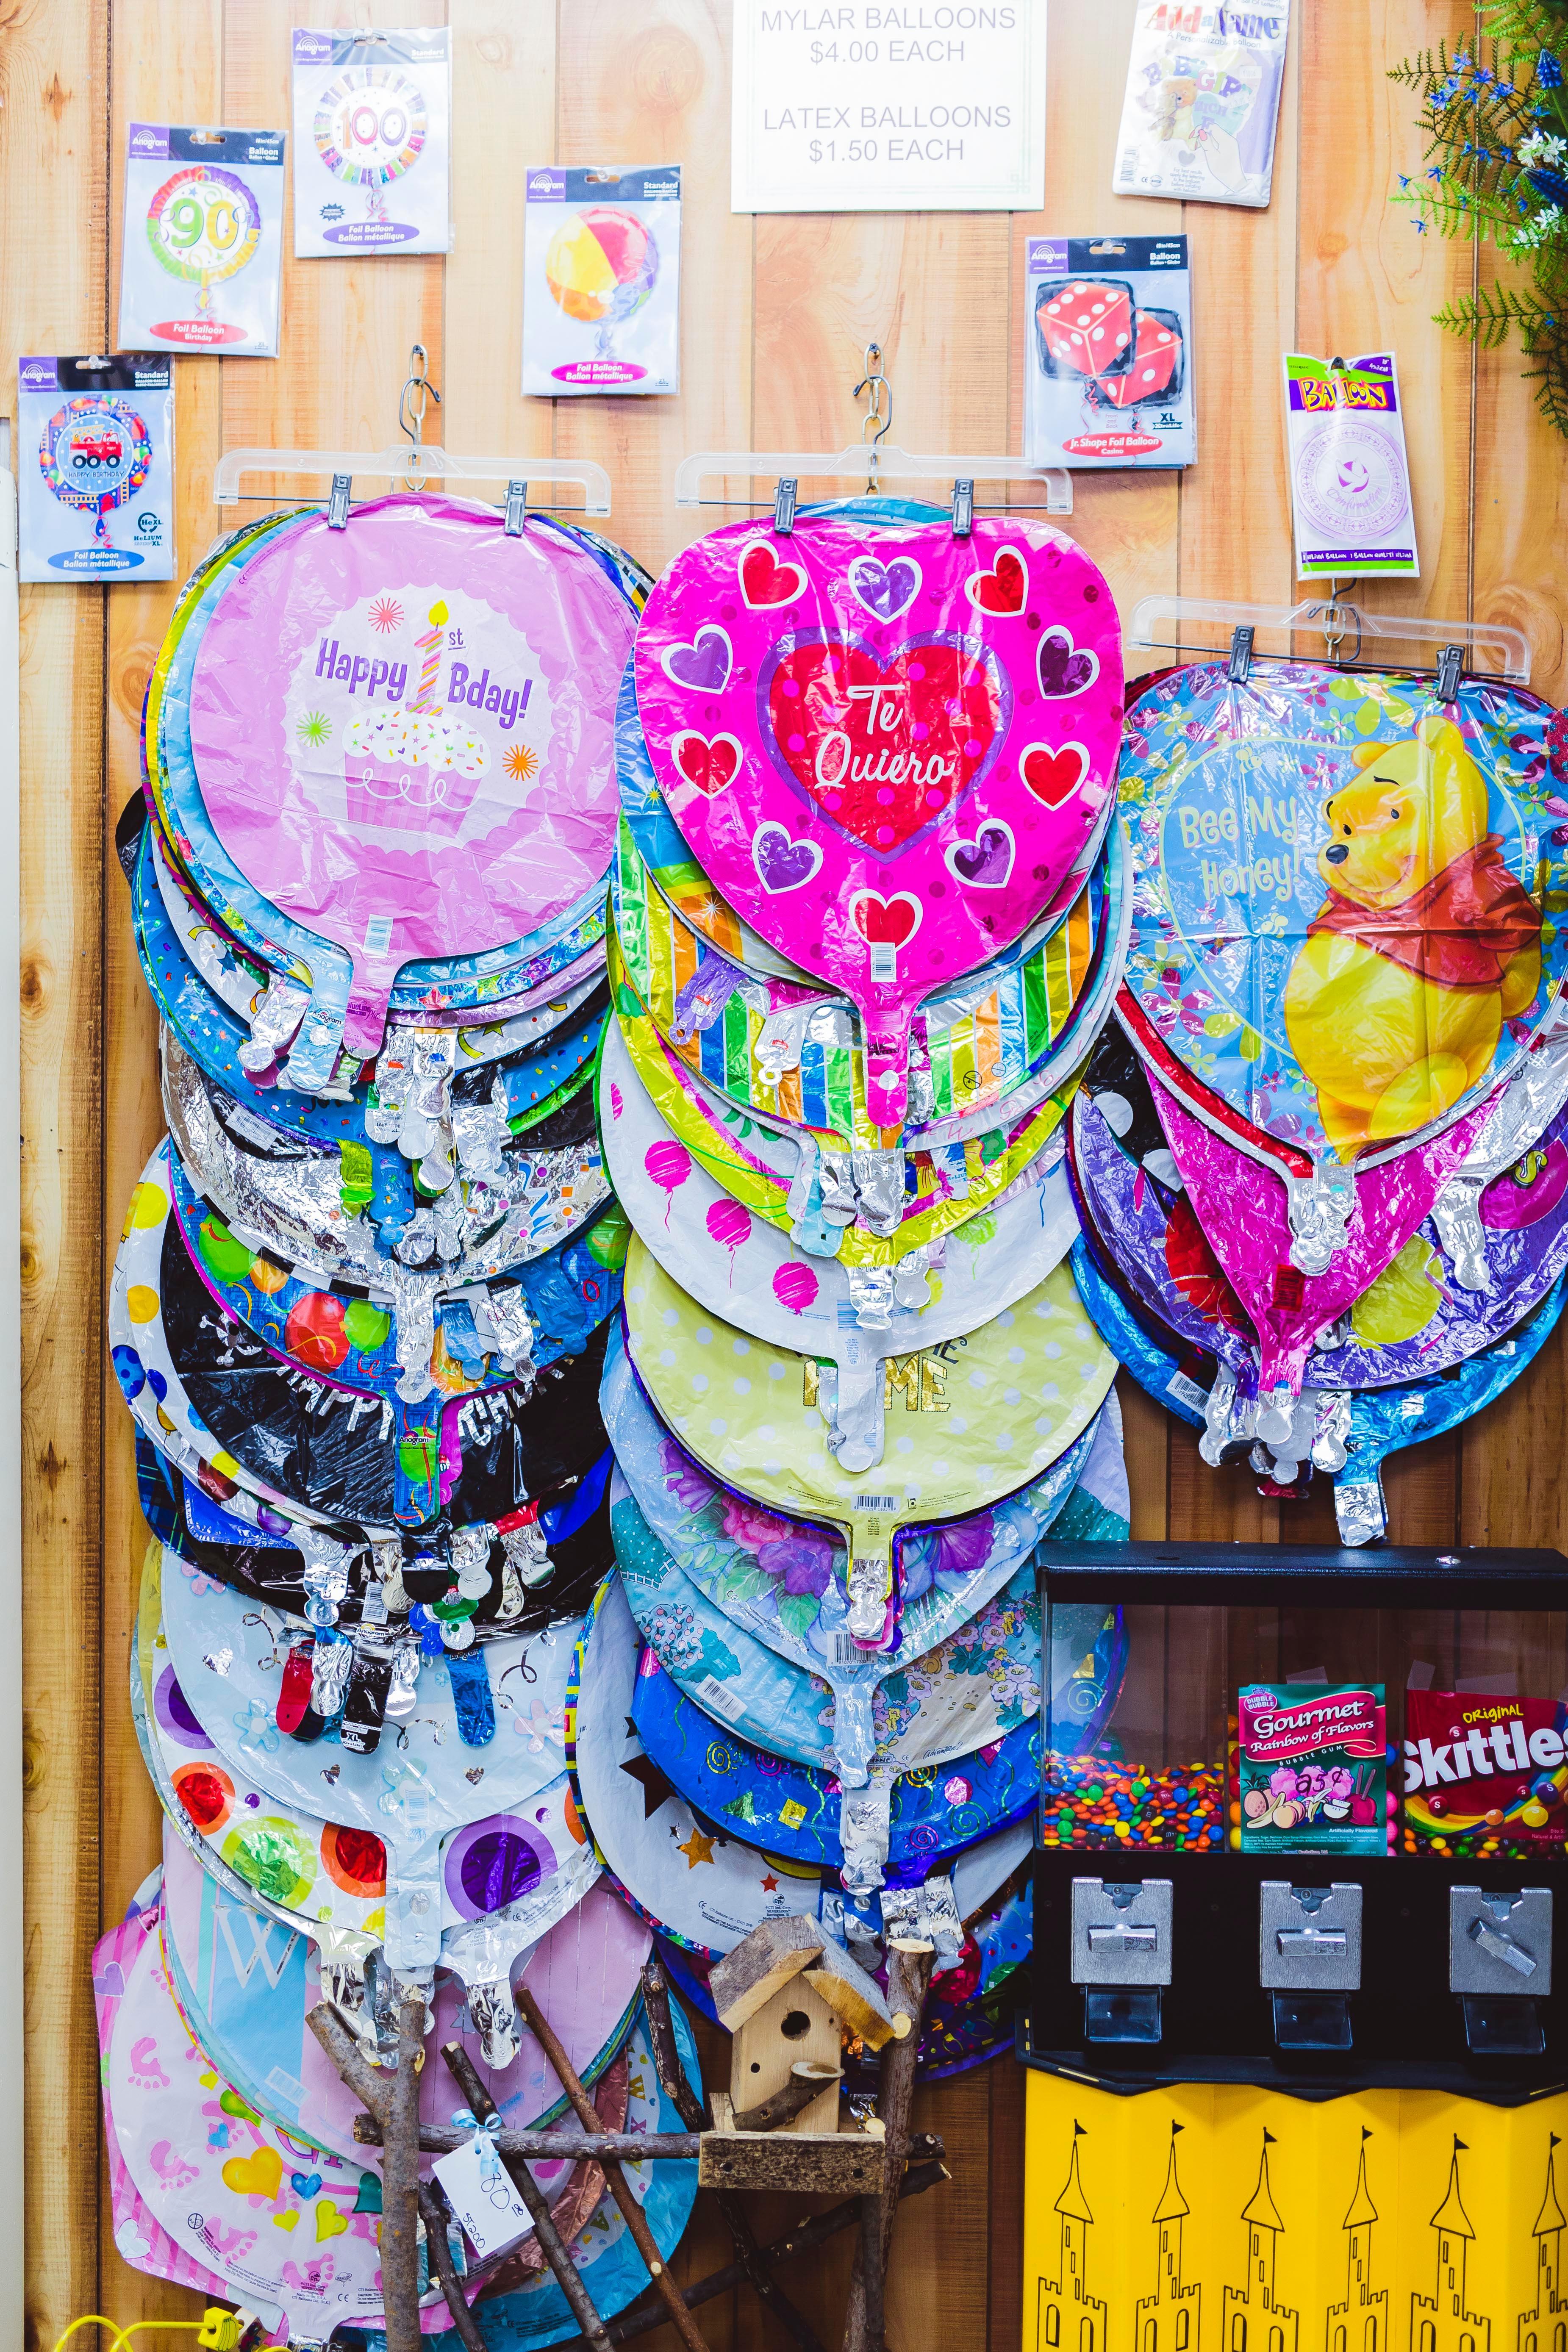 Sid's Flower Shop image 24